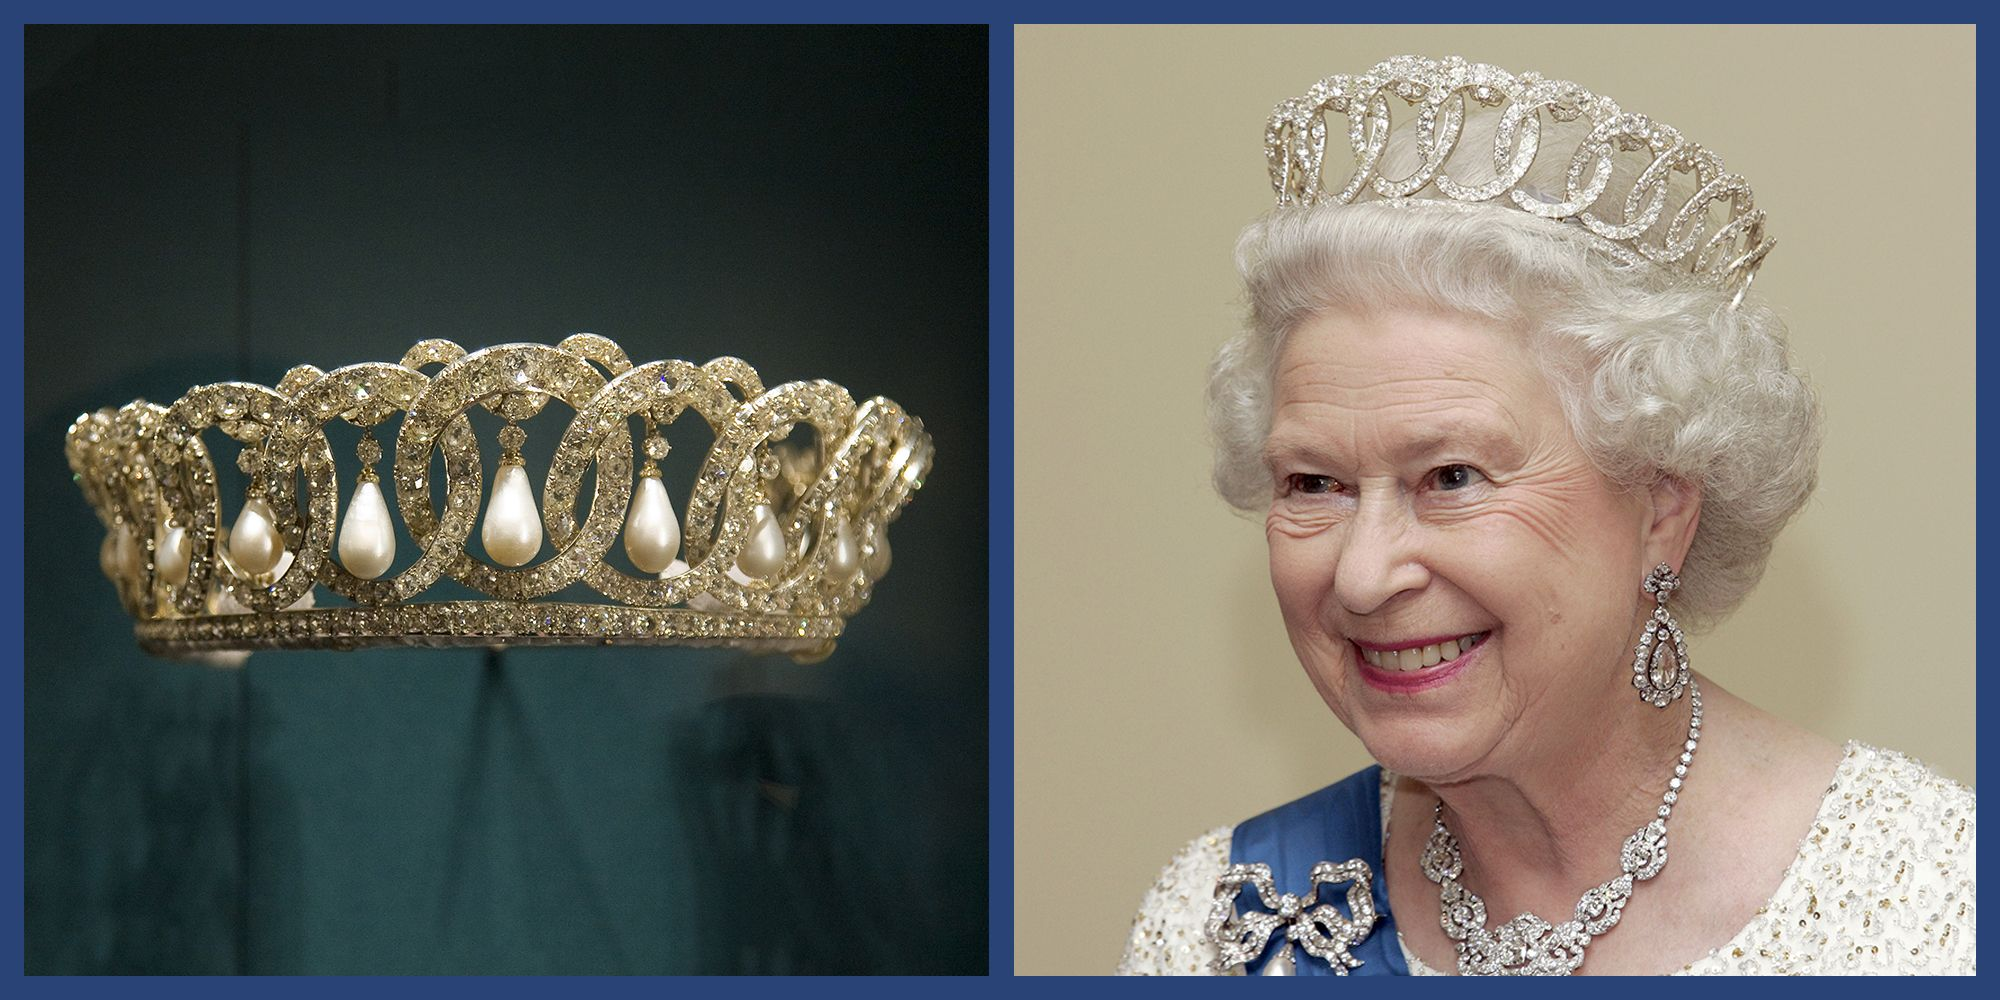 Queen Elizabeth's Favorite Tiara - How a Romanov Jewel Became Part ...